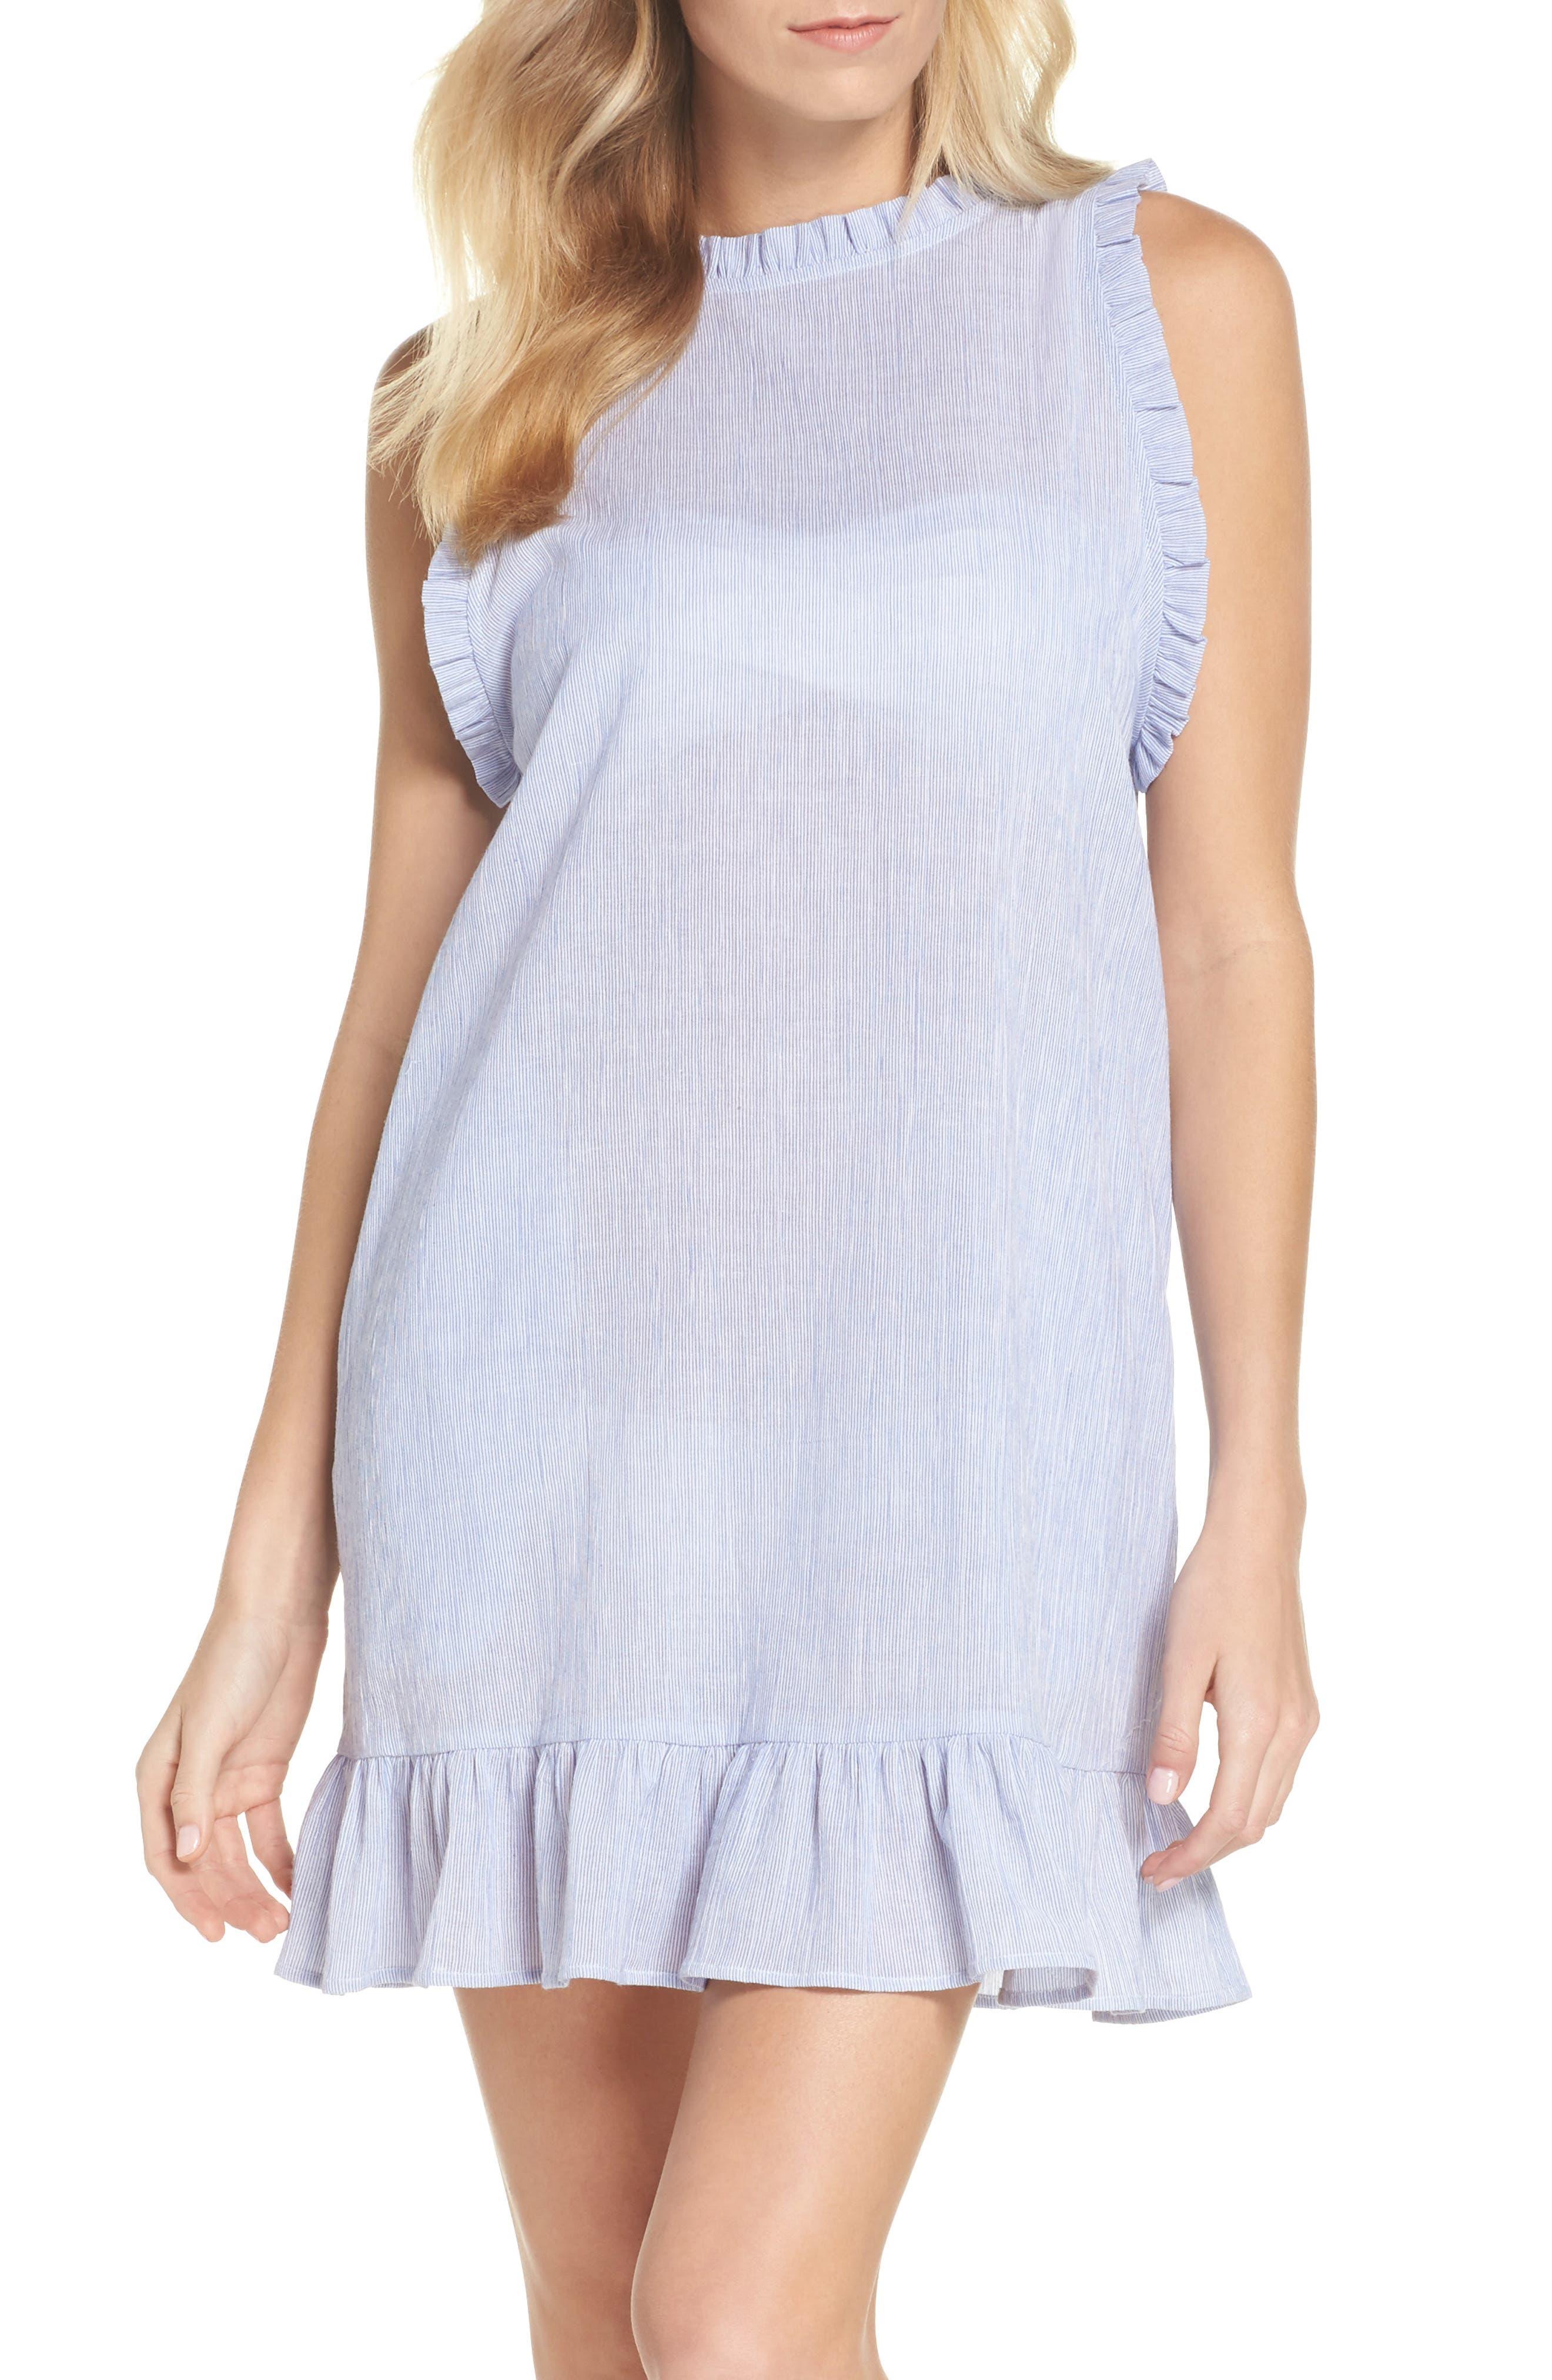 Heidi Cover-Up Dress,                             Main thumbnail 1, color,                             401